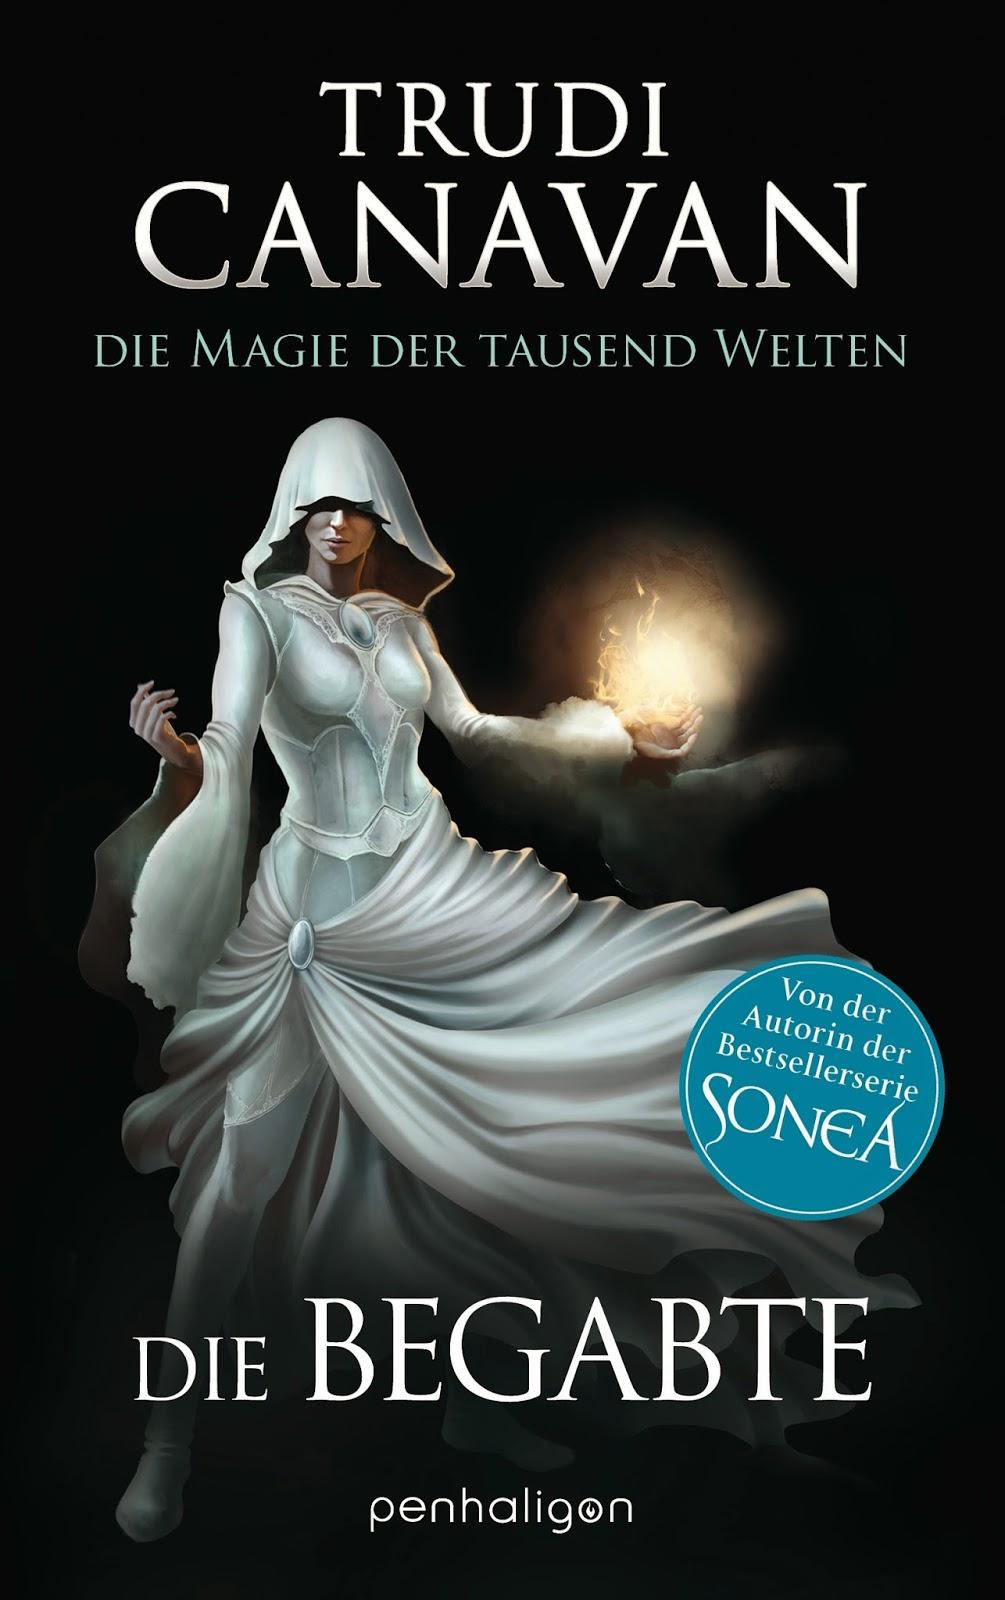 http://www.randomhouse.de/Presse/Buch/Die-Magie-der-tausend-Welten-Die-Begabte-Roman/Trudi-Canavan/pr390112.rhd?mid=2&showpdf=false&per=153383&men=1&pub=45000#tabbox